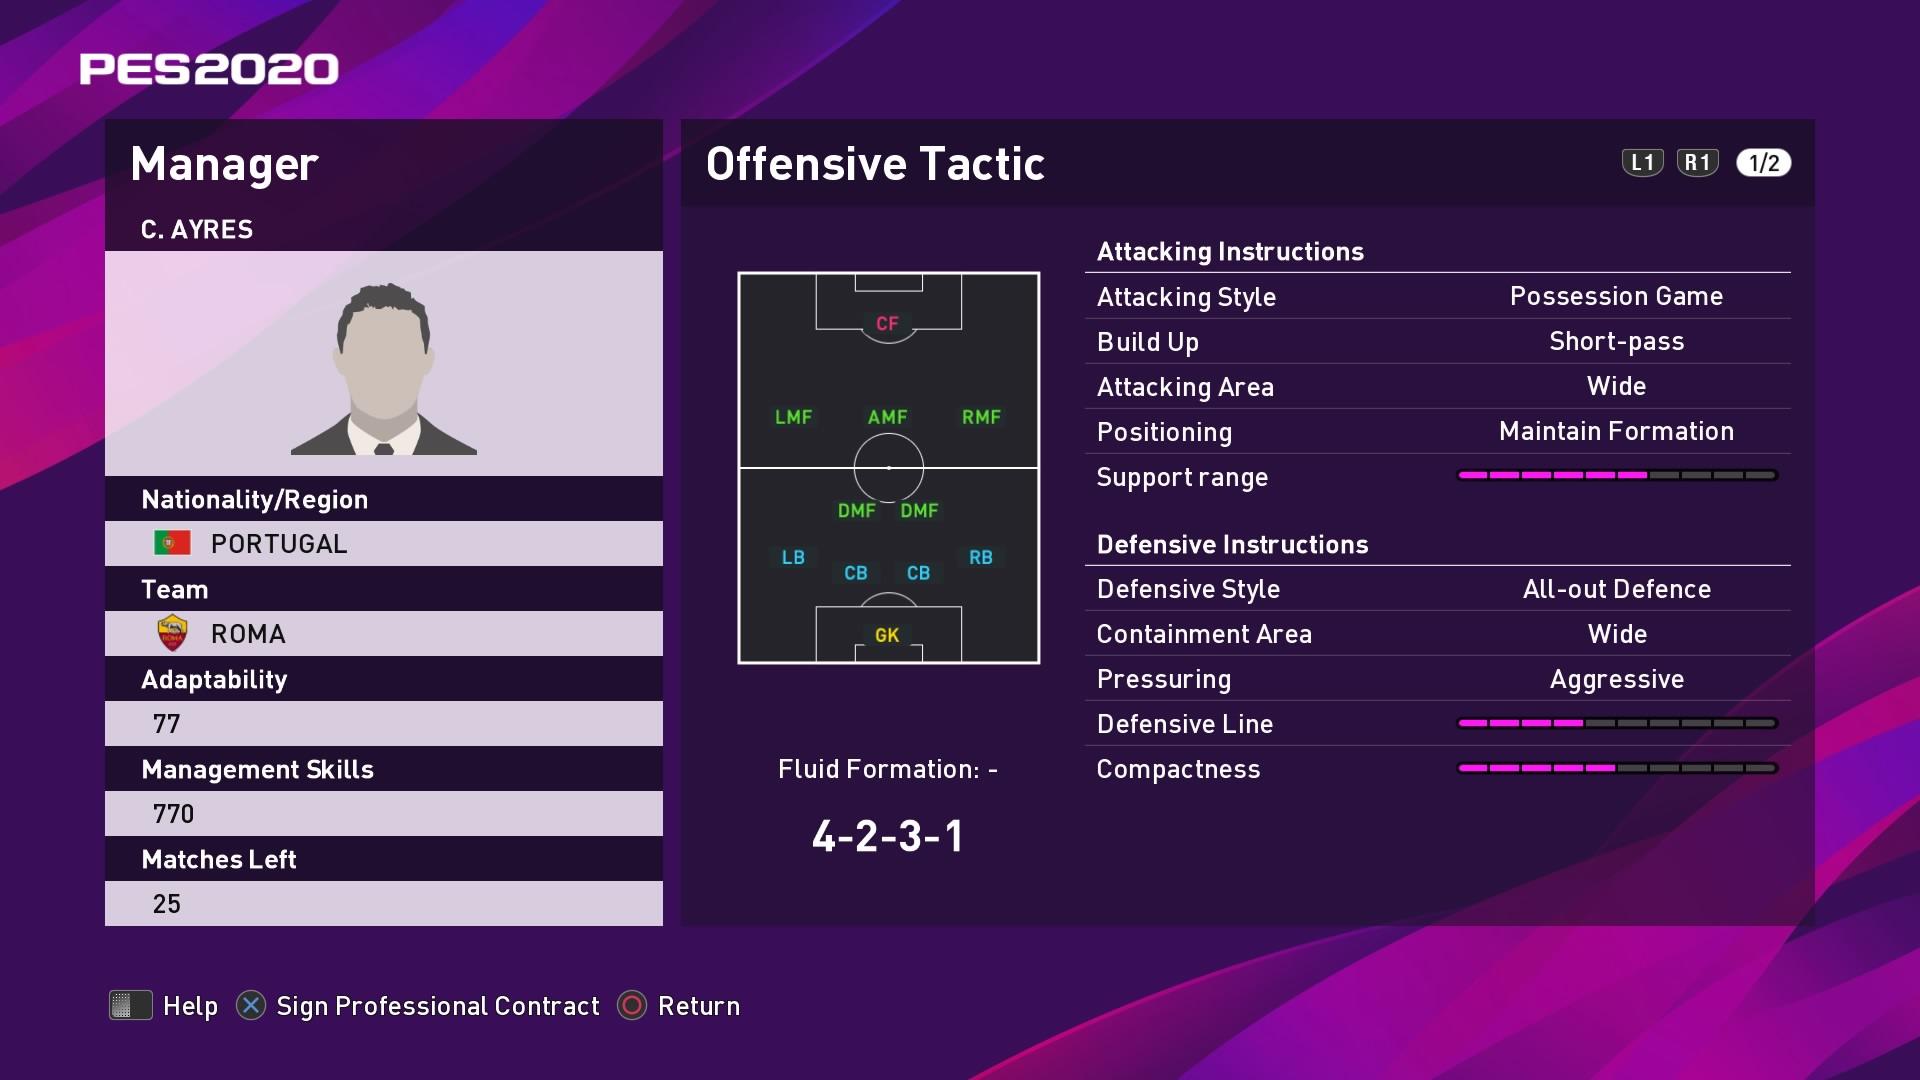 C. Ayres (Paulo Fonseca) Offensive Tactic in PES 2020 myClub